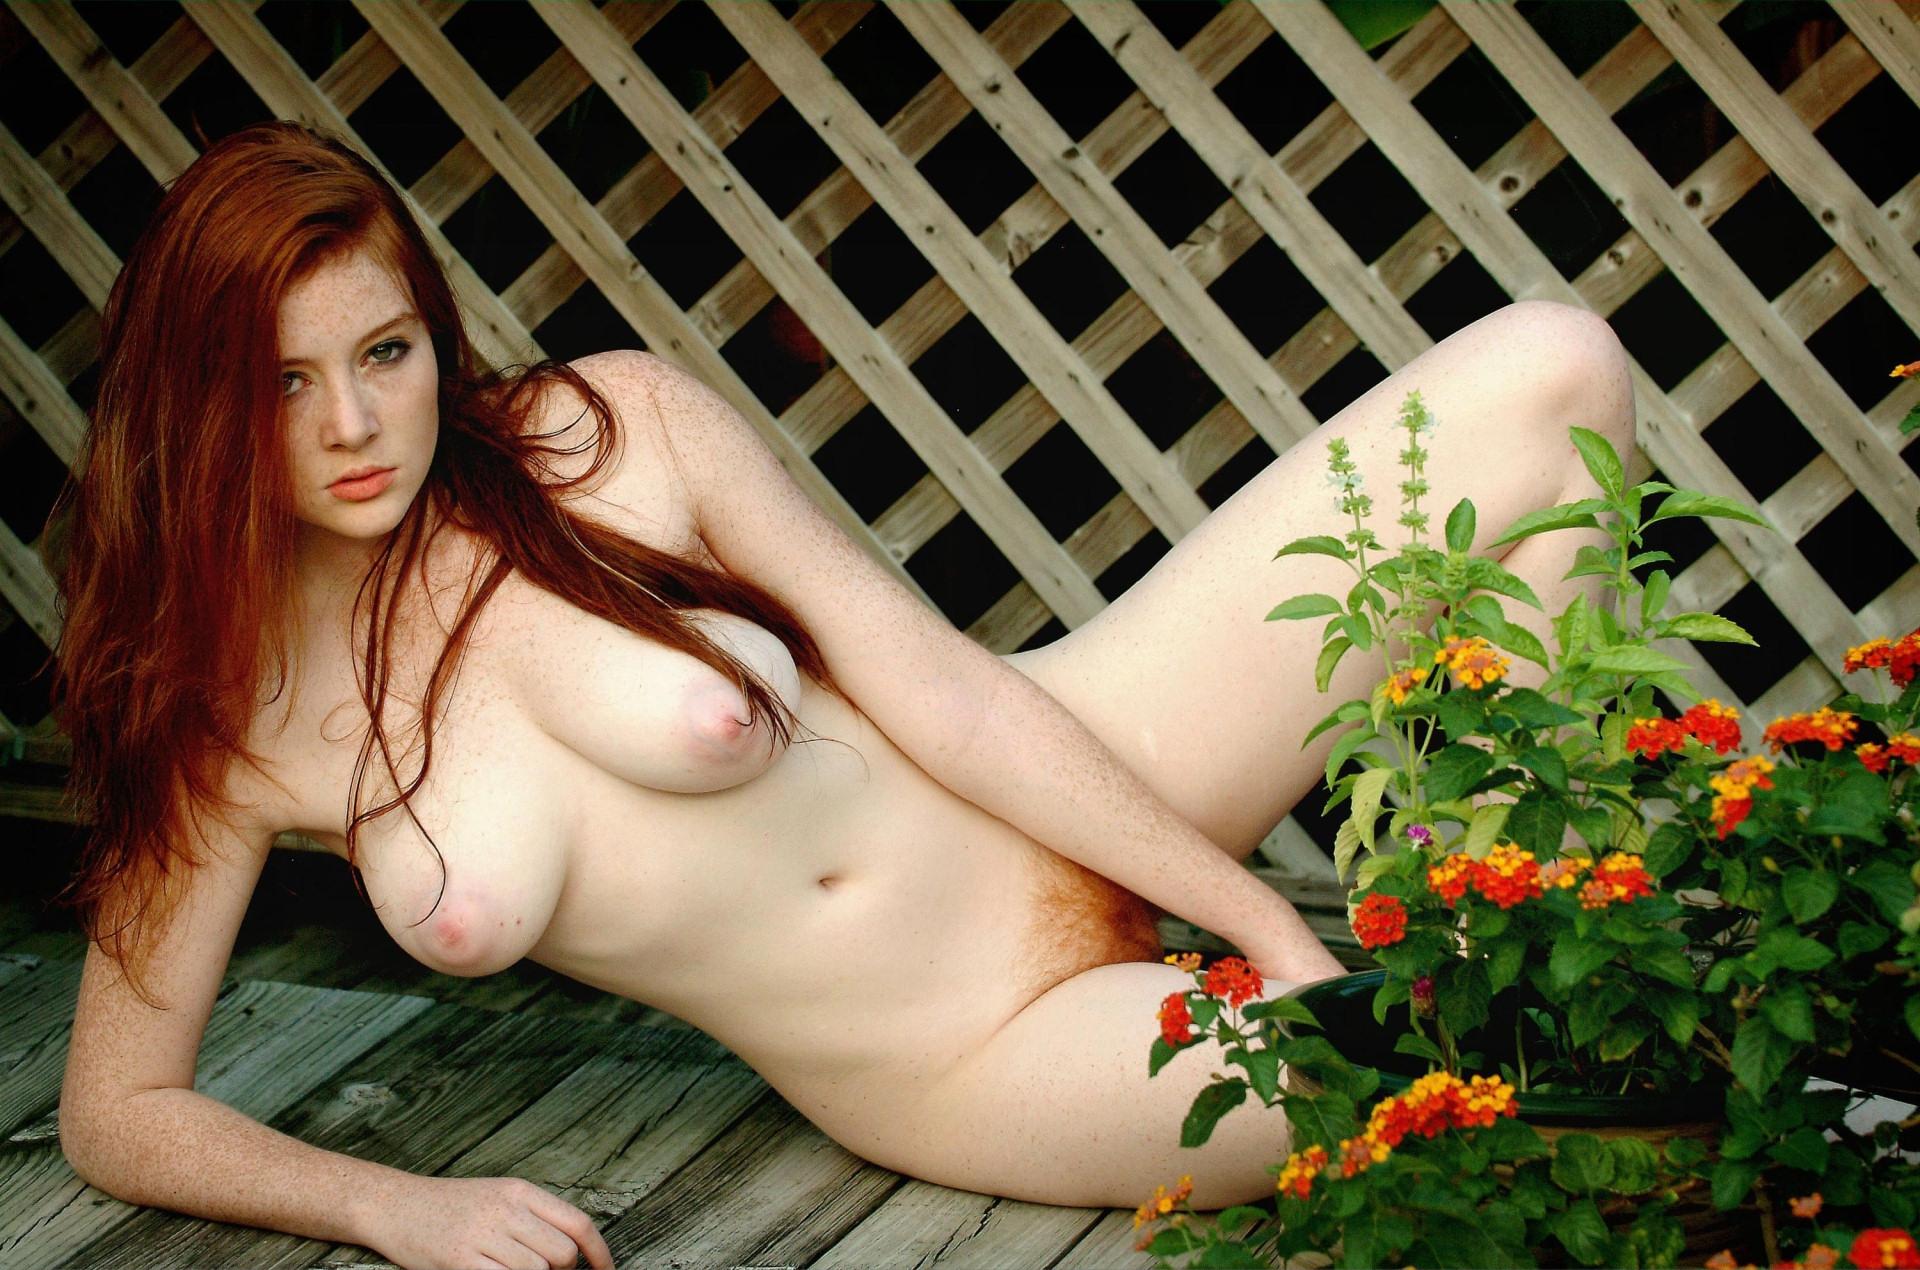 redheads-55